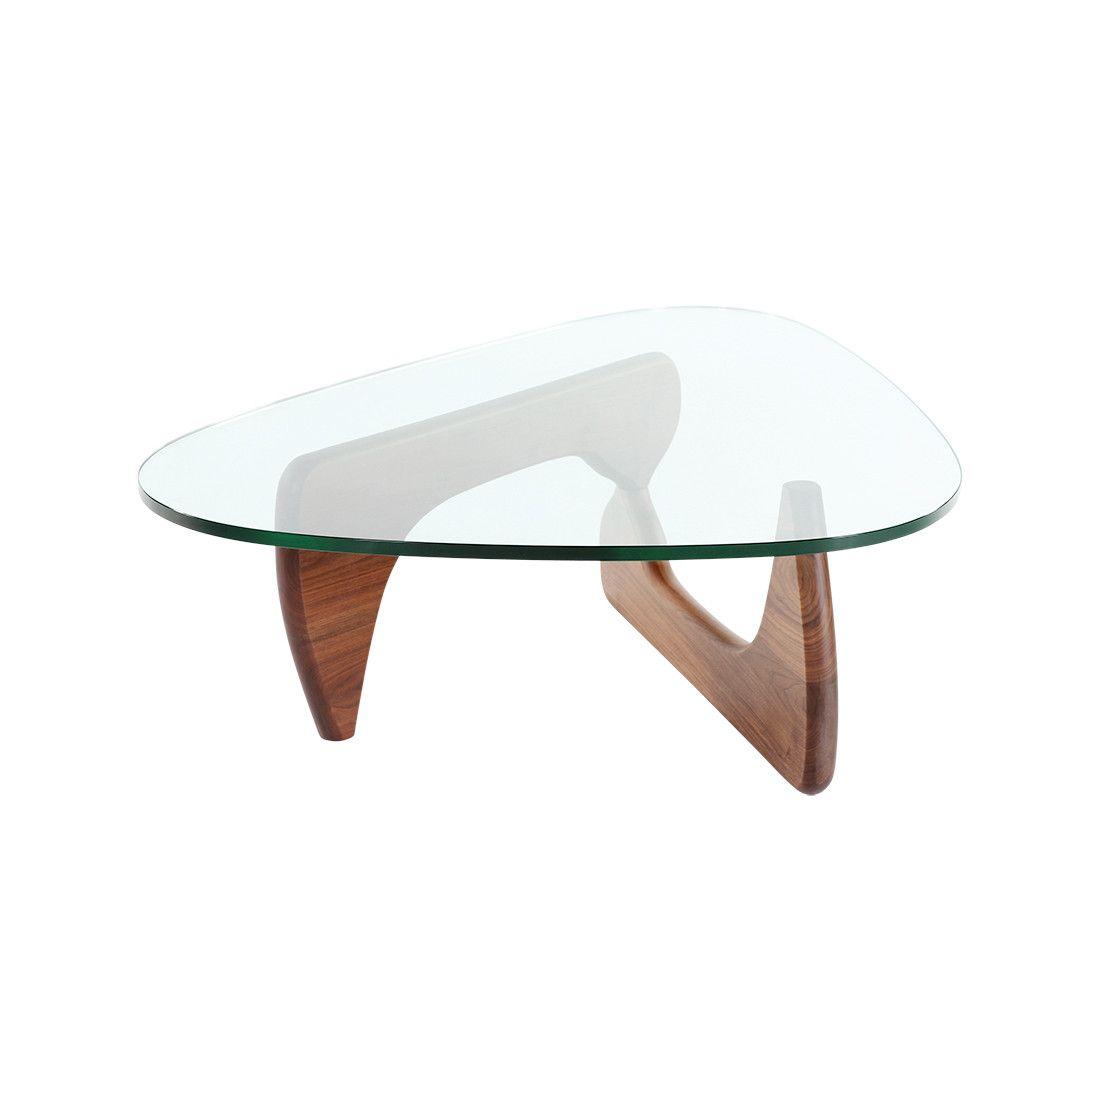 Noguchi Coffee Table American Walnut Triangle Coffee Table Noguchi Coffee Table Coffee Table [ jpg ]